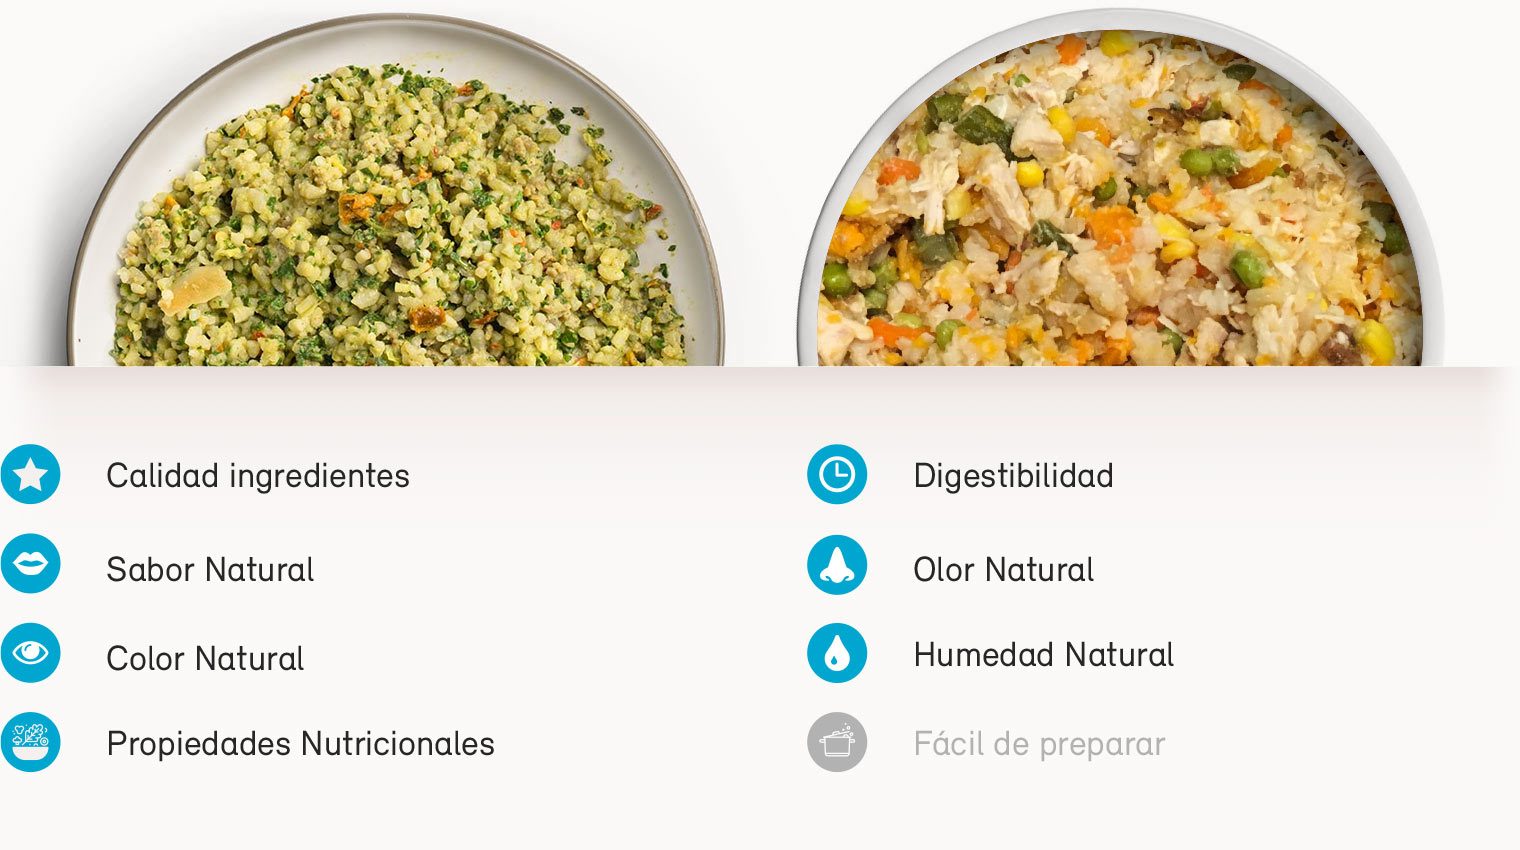 Naku versus comida casera